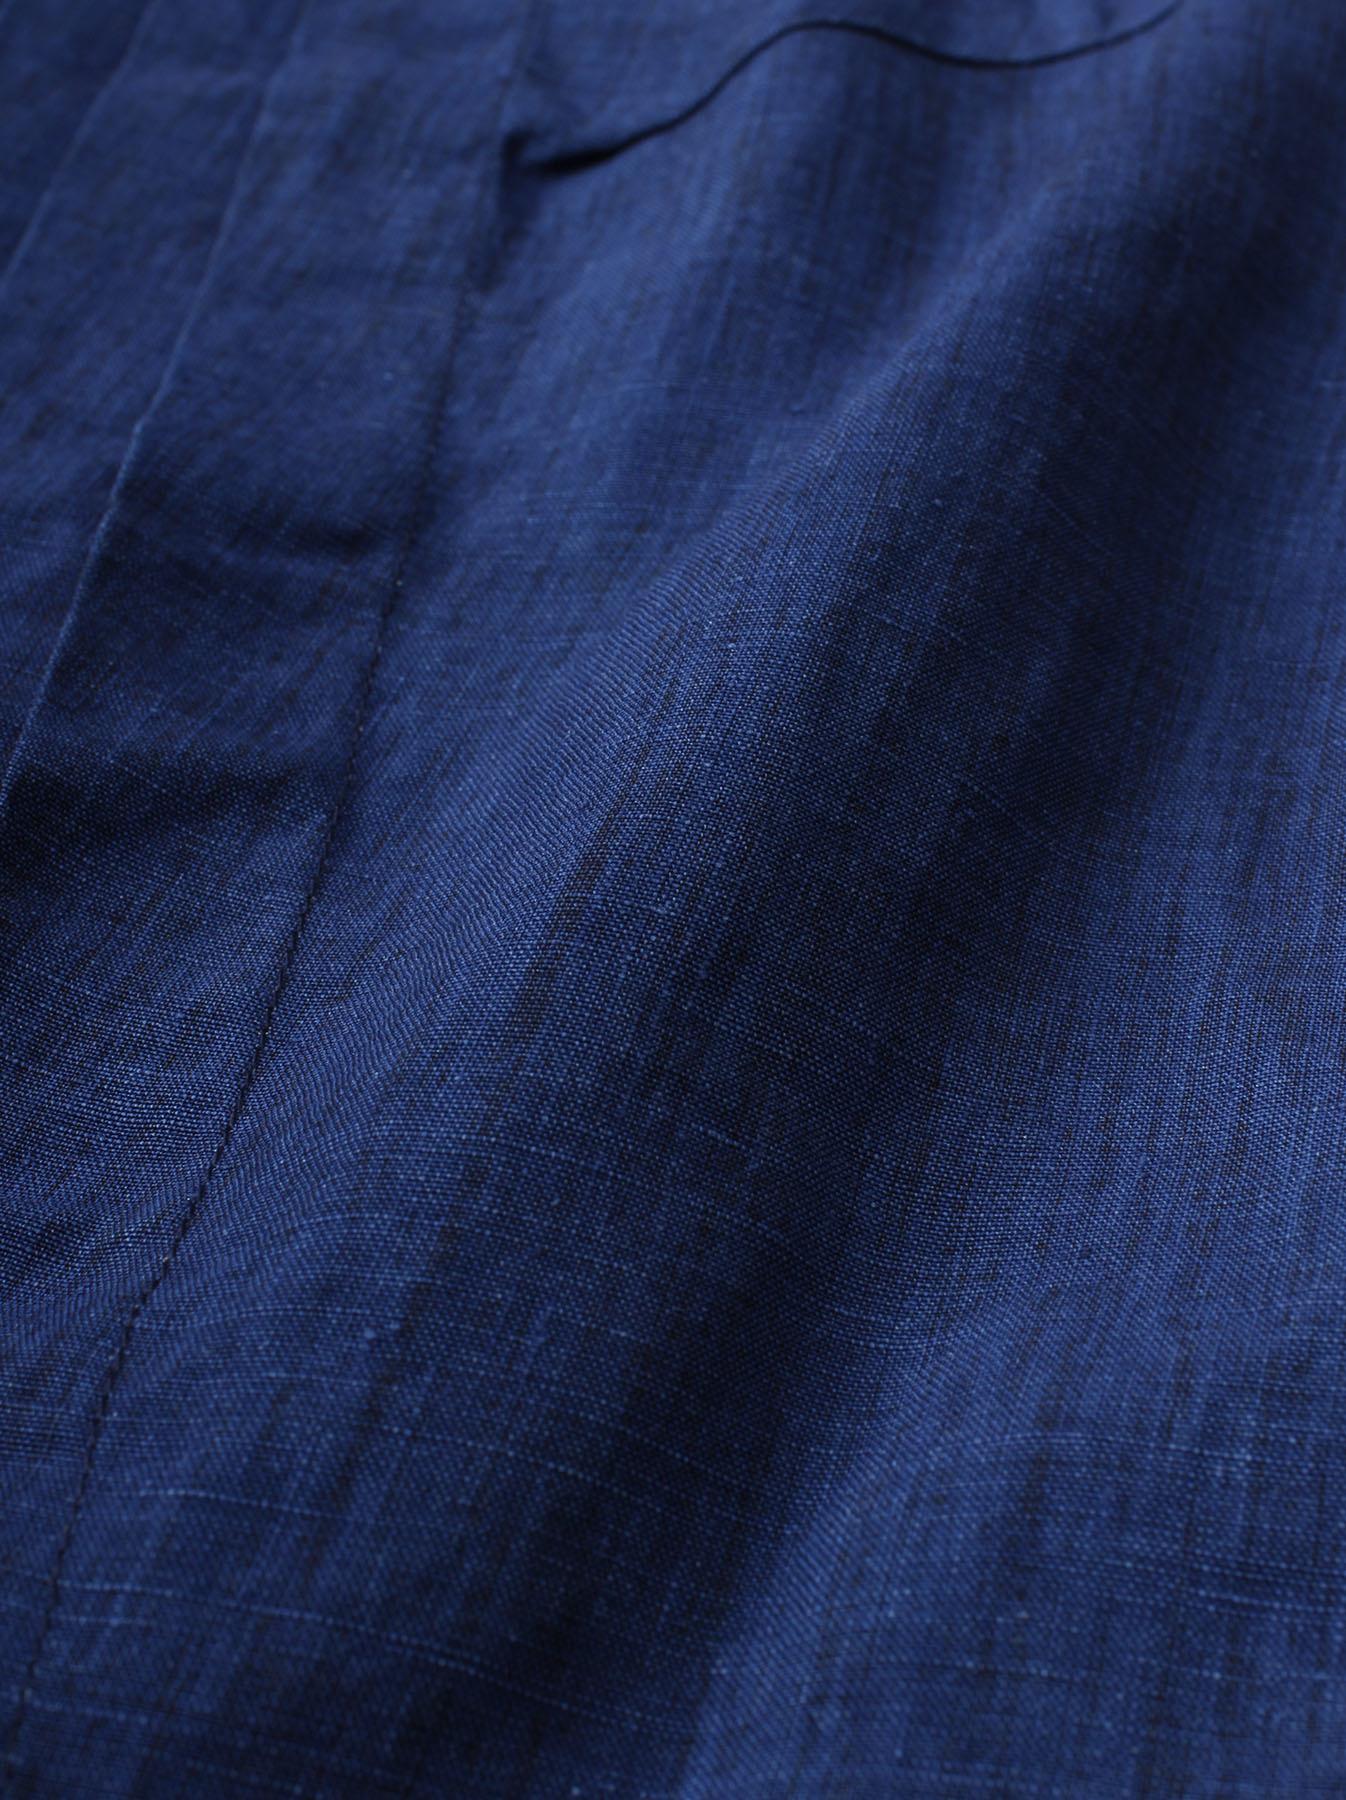 WH Indigo Linen Sleeveless Tuck Blouse-12